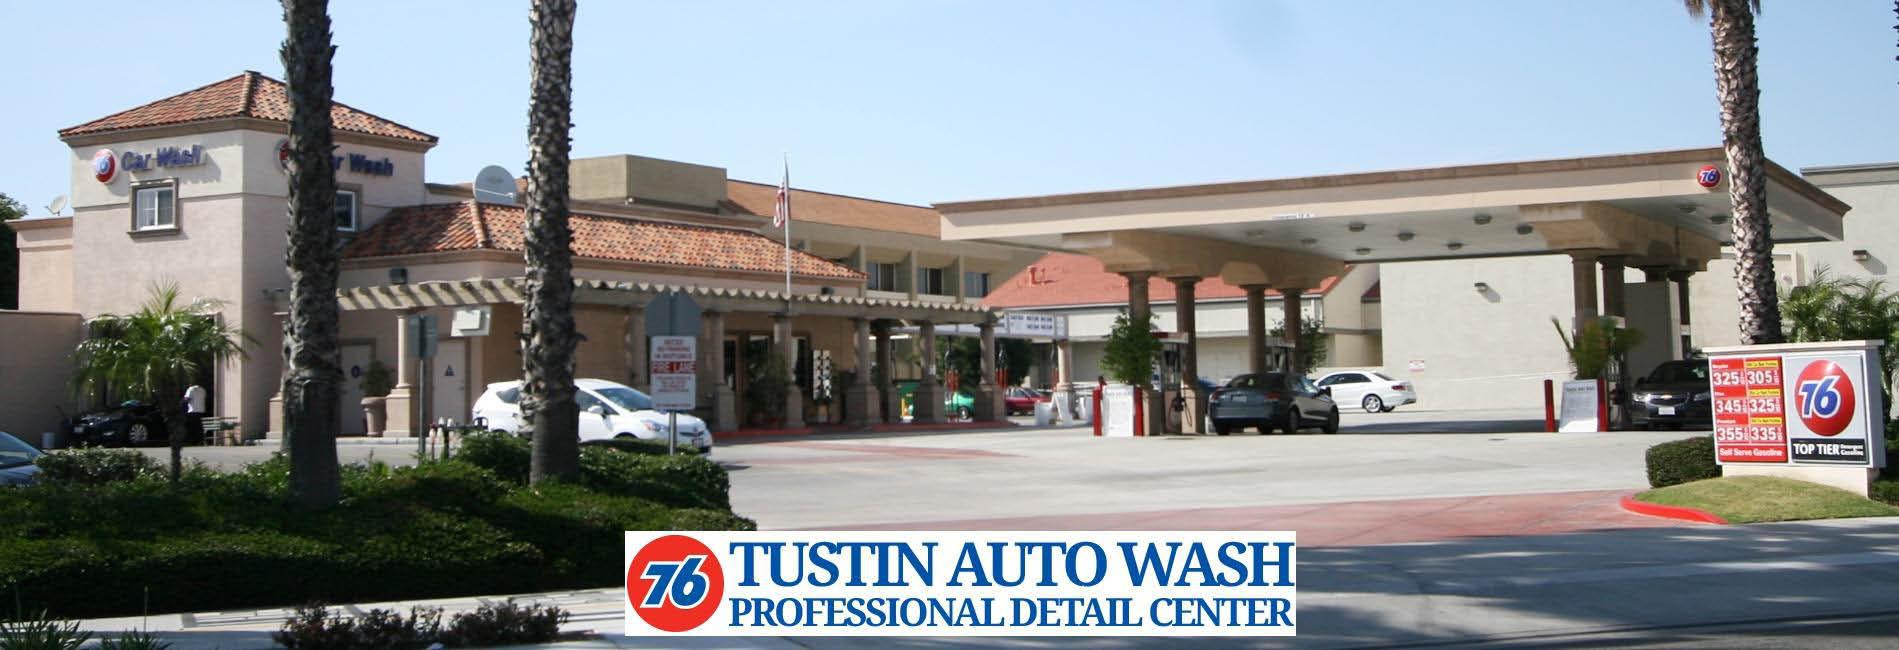 Car Wash Near Tustin Ca